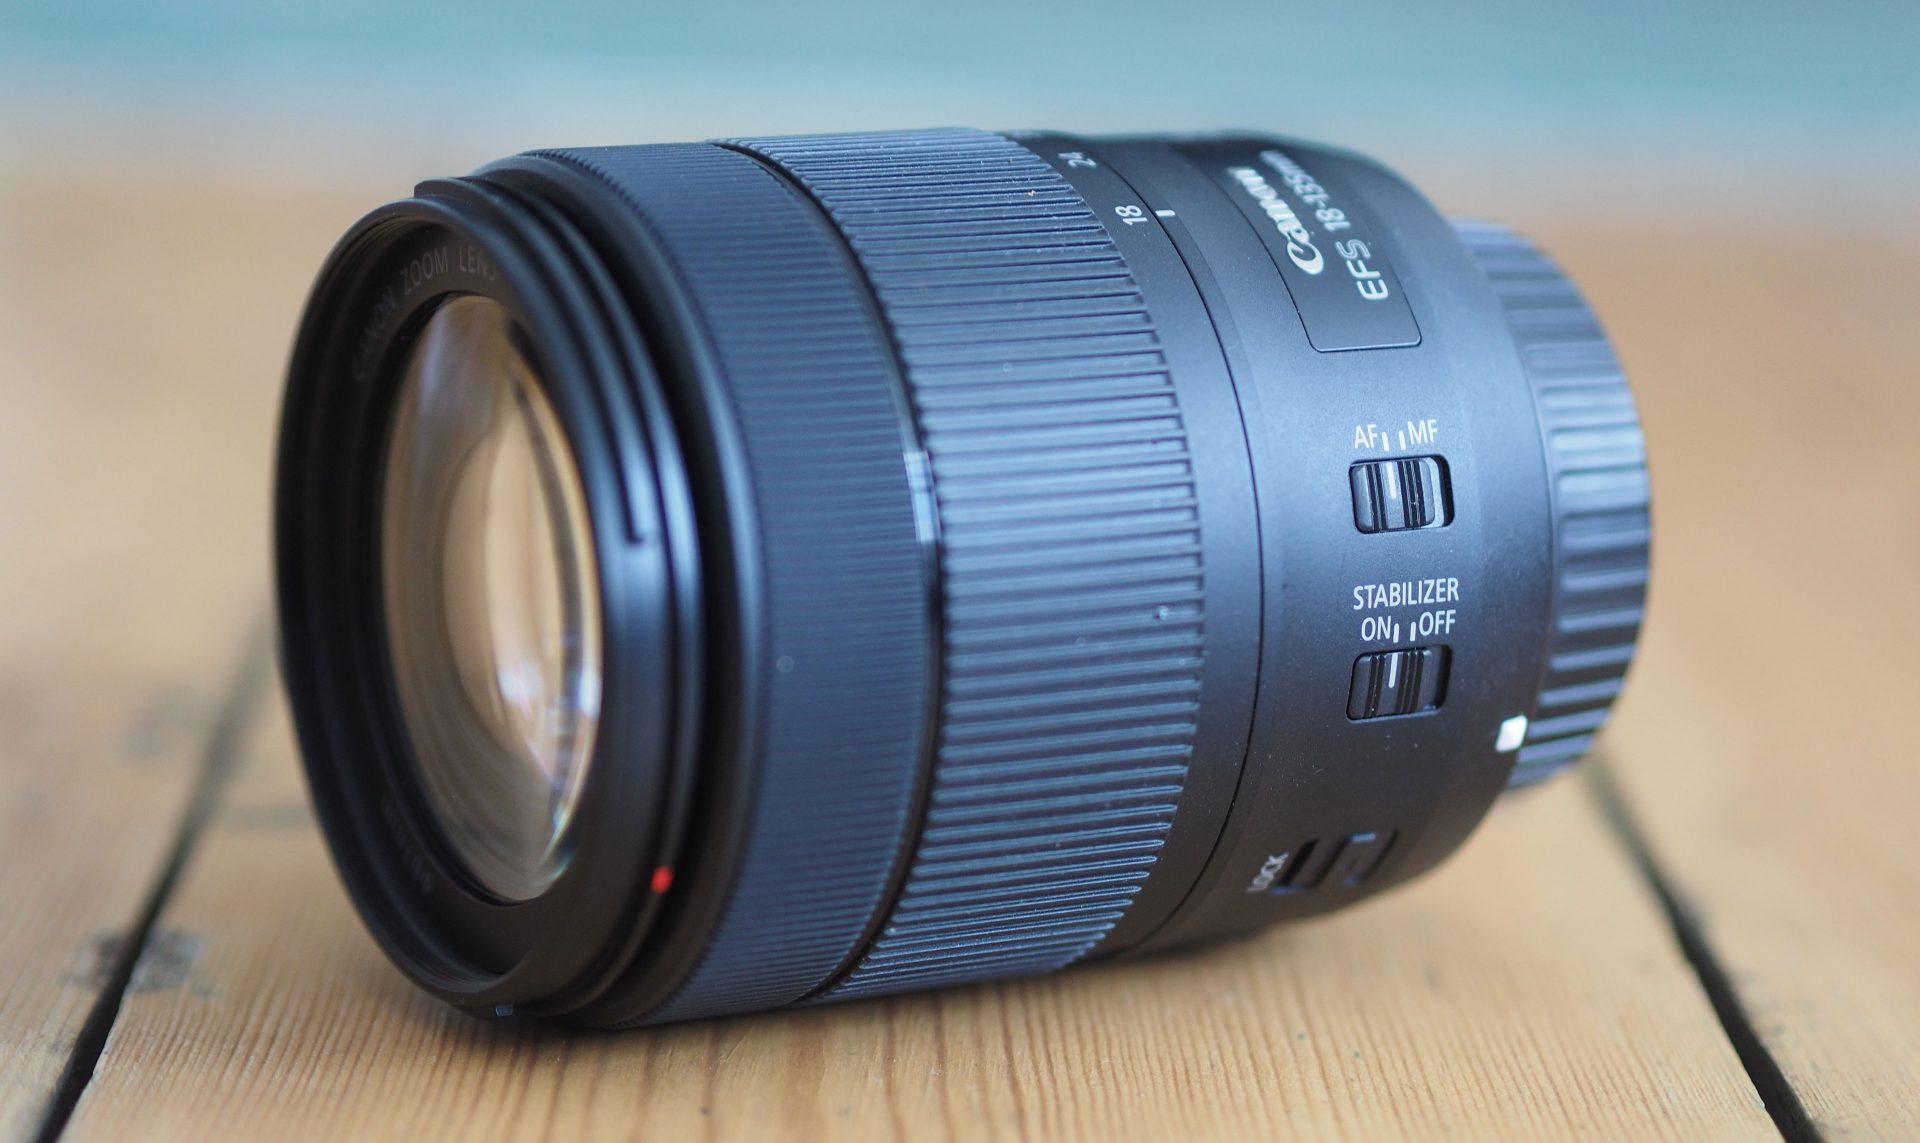 Canon-efs-18-135mm-is-usm-header1